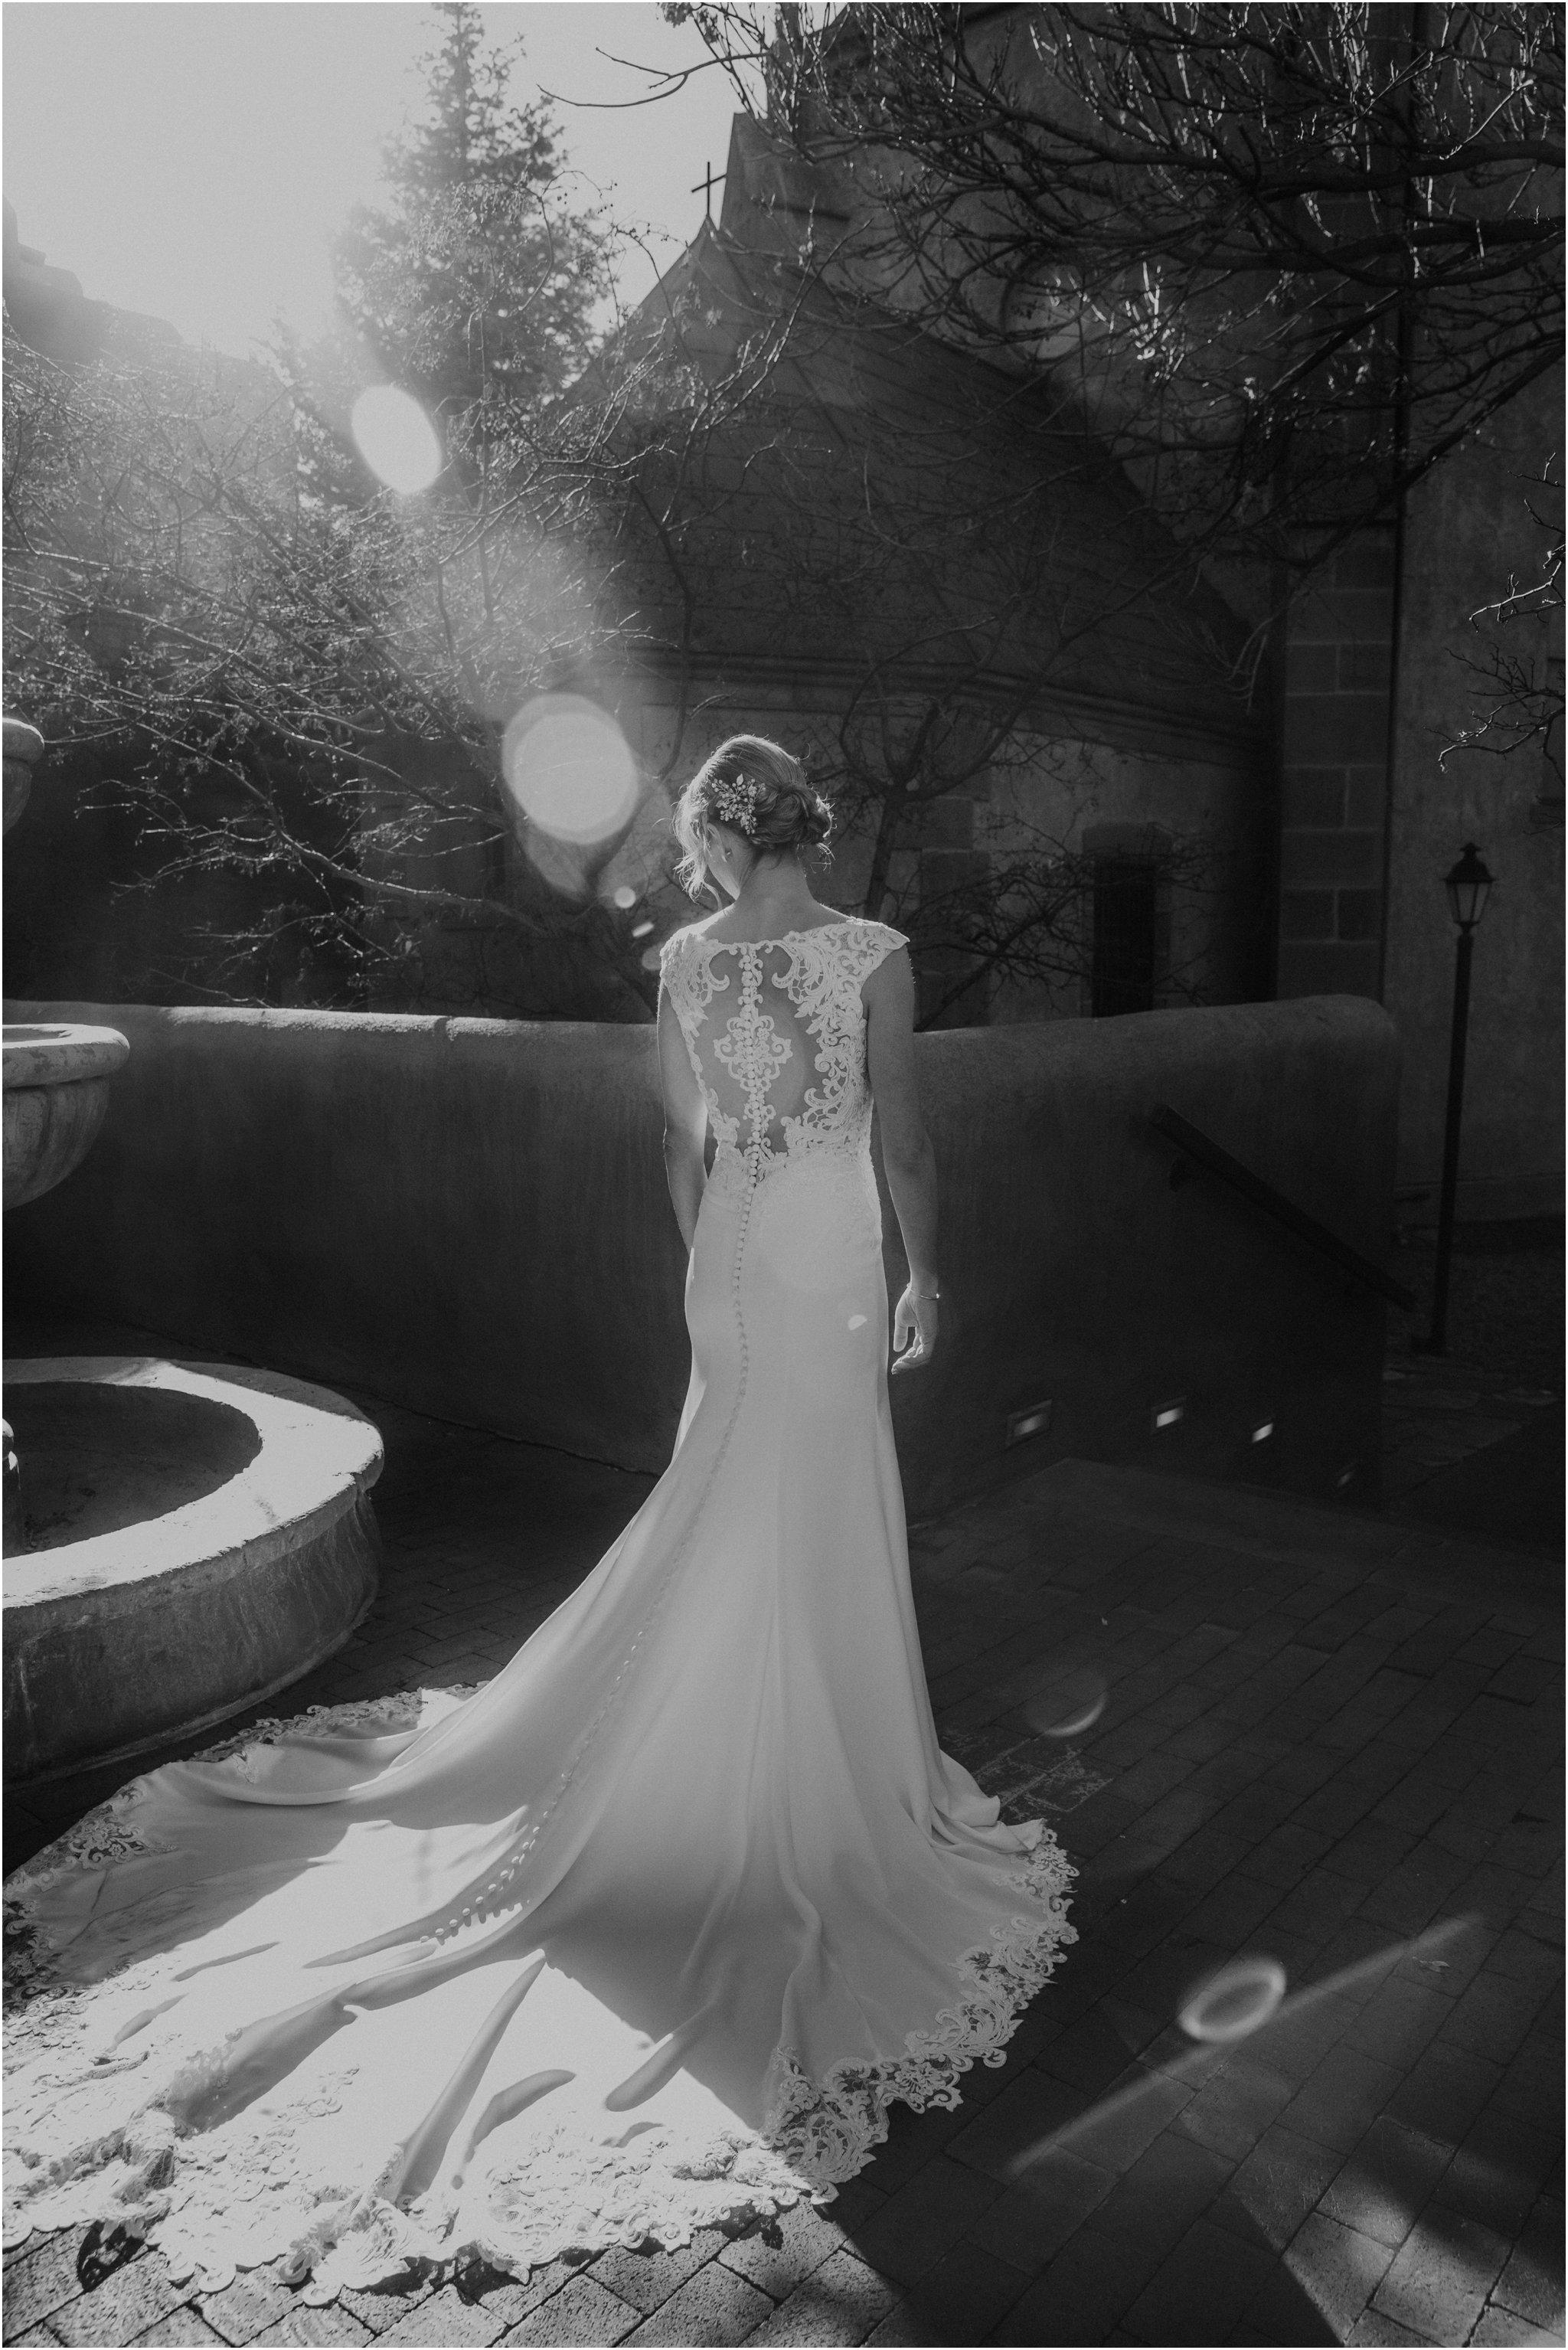 0895Loretto Chapel Wedding, Inn and Spa at Loretto wedding, Santa Fe wedding photographers, blue rose photography